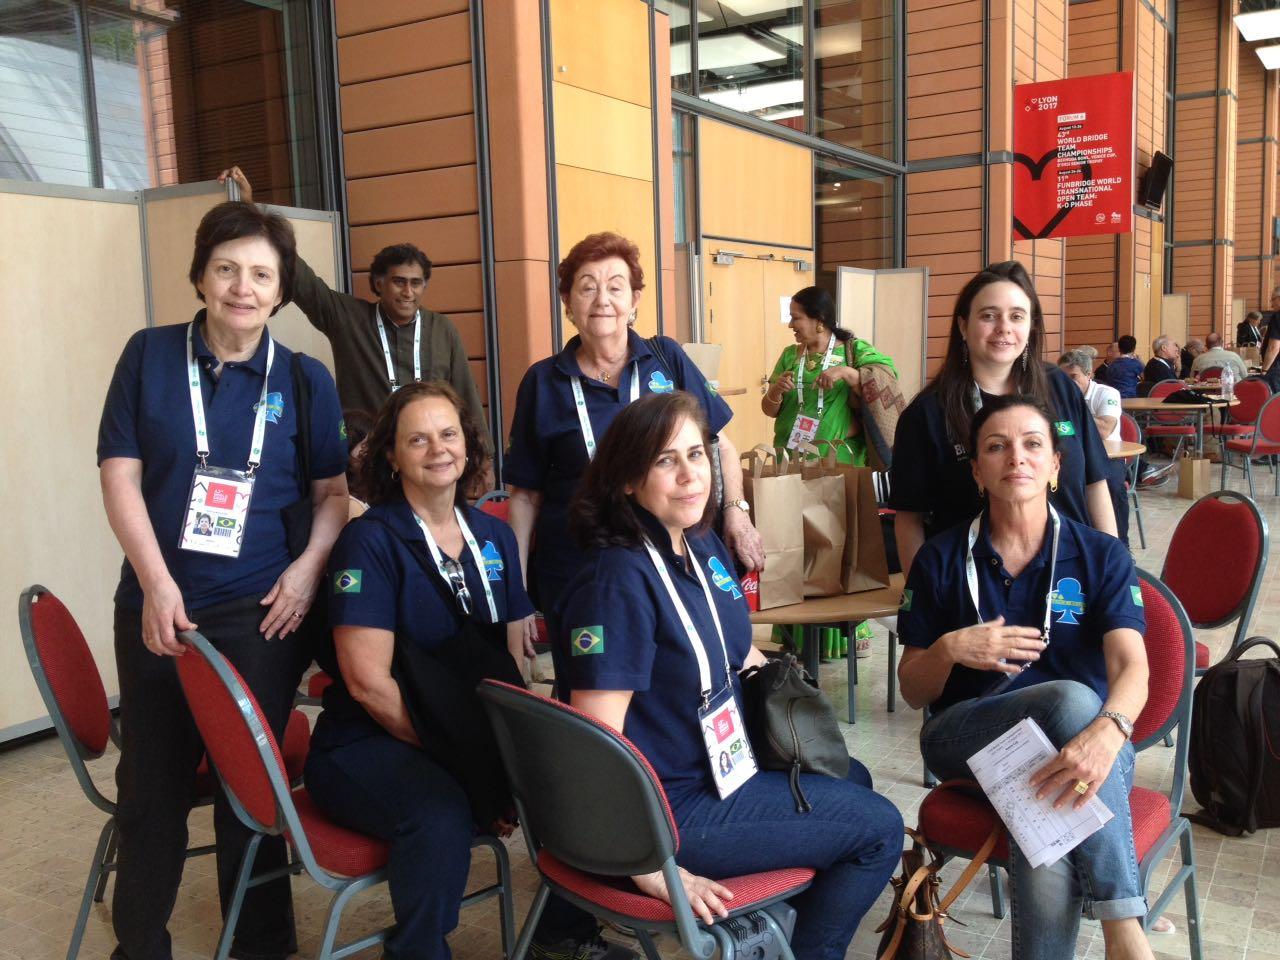 equipe feminina de bridge em Lyon 2017